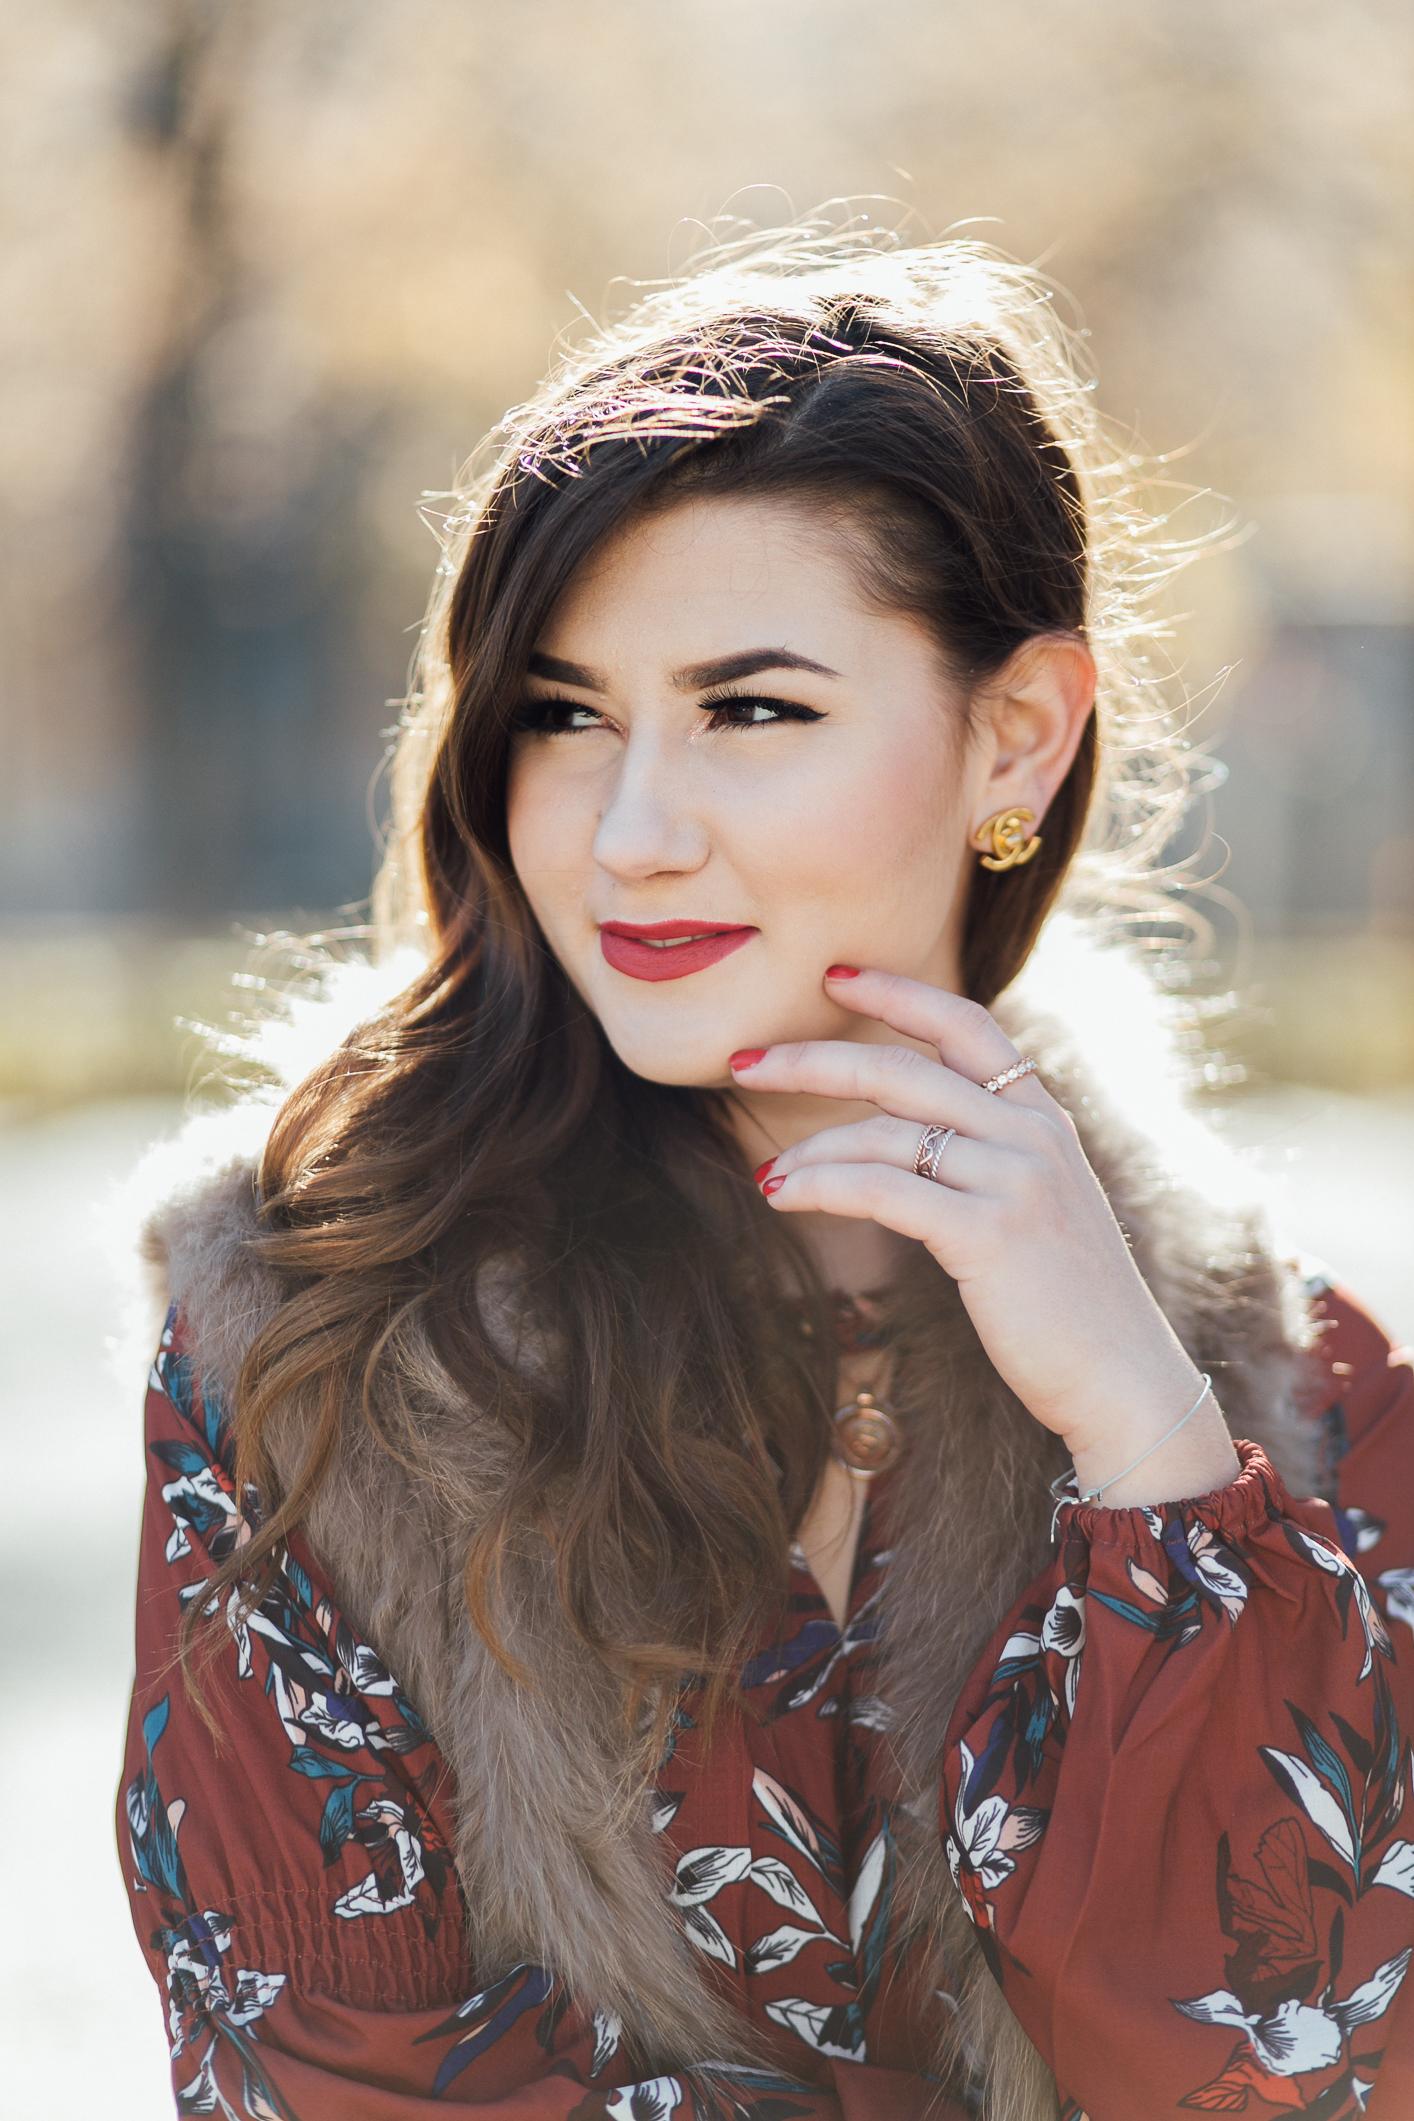 sara-bow-münchen-blogger-youtuber-herbst-2015